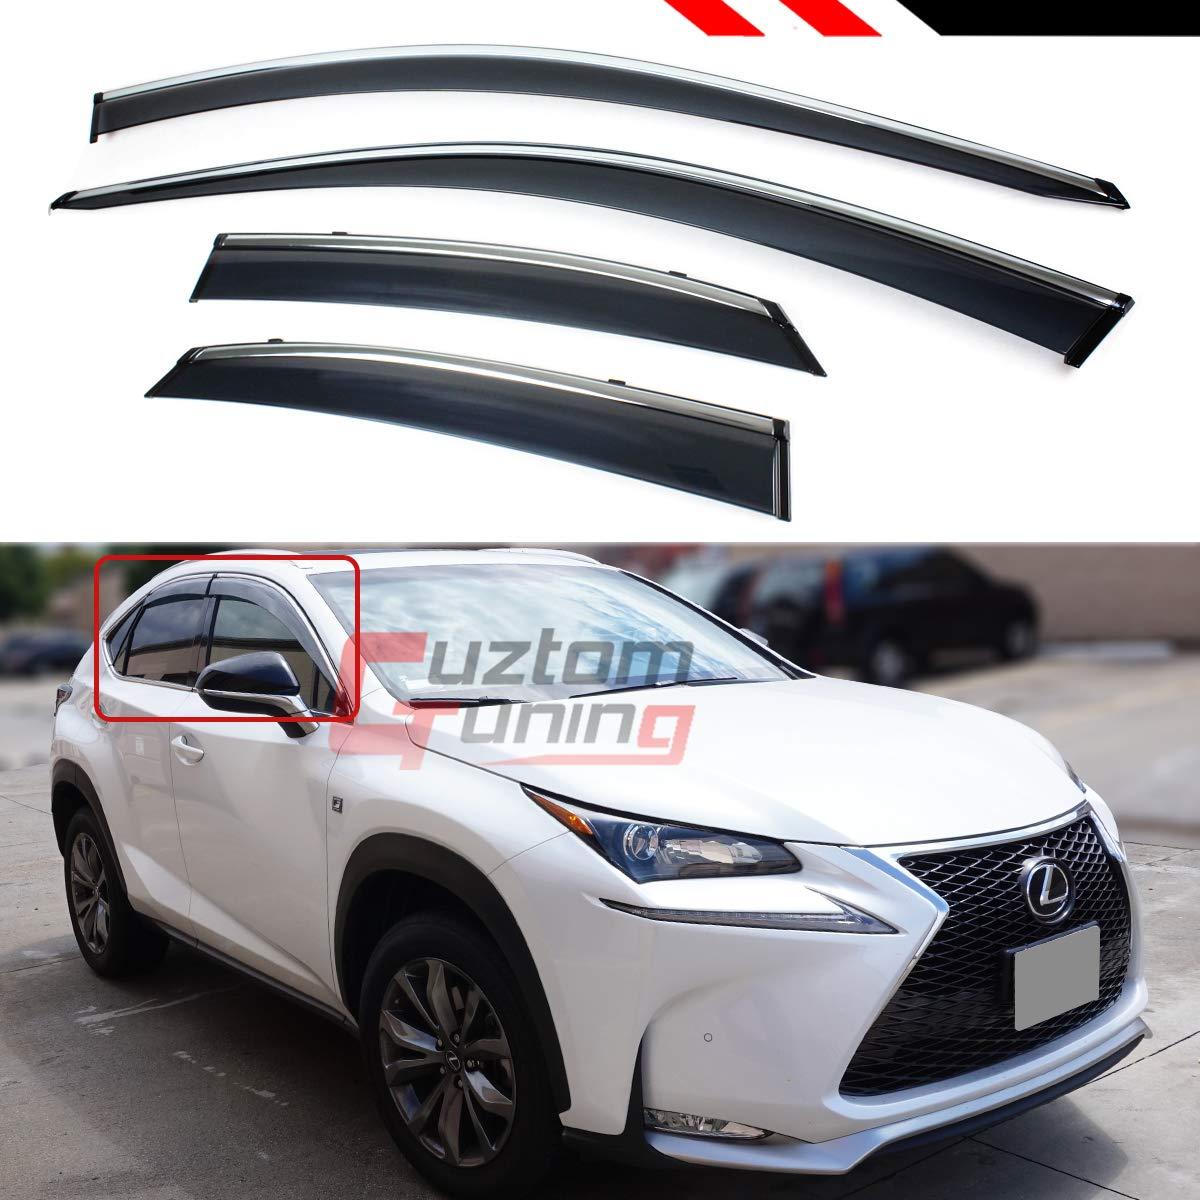 Fits for 2015-2019 Lexus NX200t NX300H F-Sport Clip-on Type Chrome Trim Window Visor Rain Guard Deflector